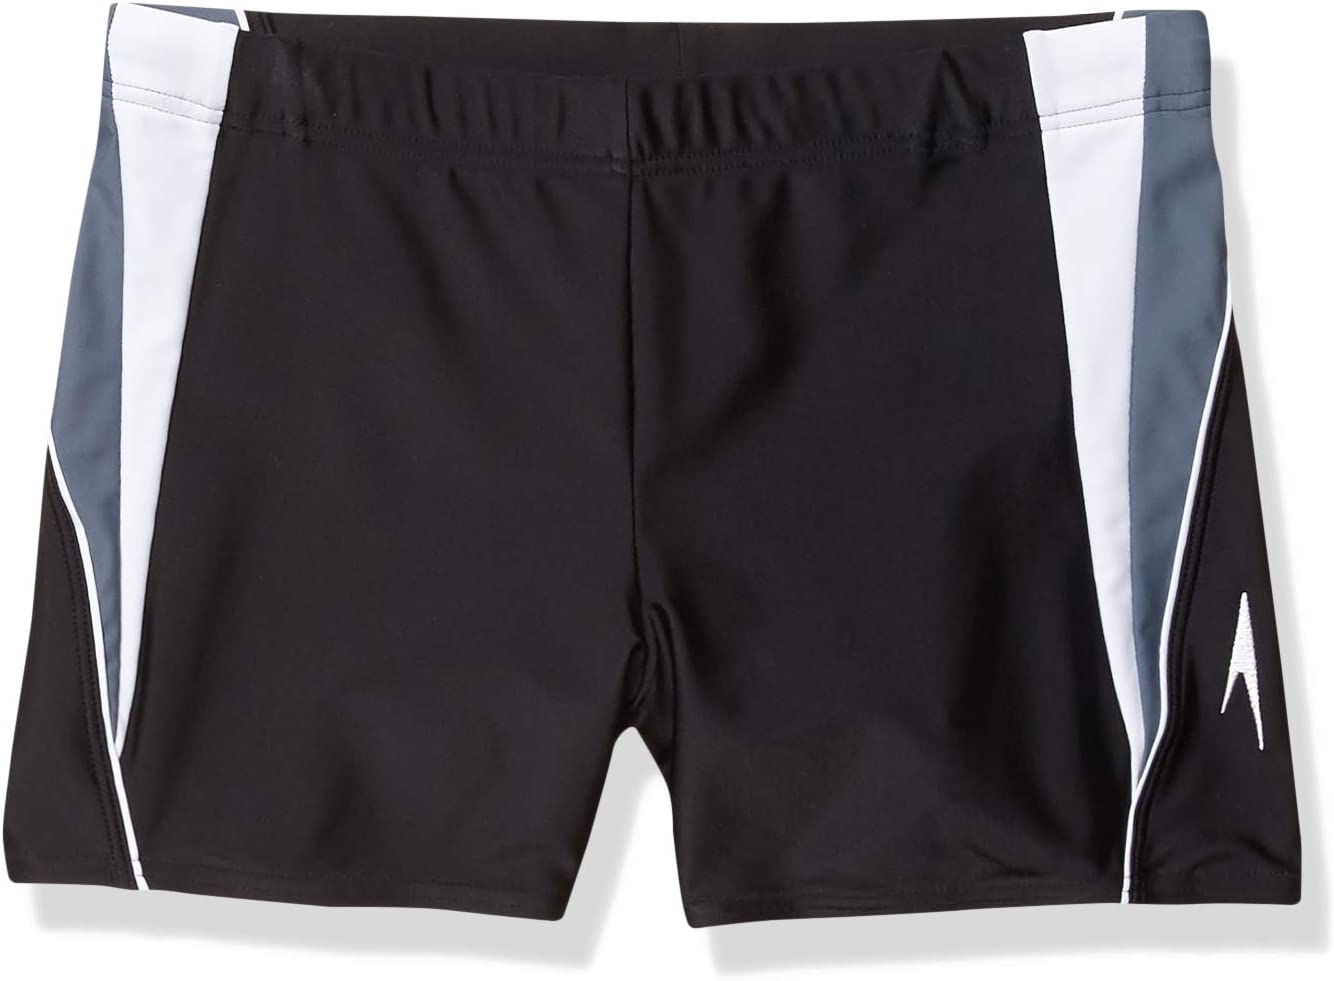 Speedo Mens Swimsuit Square Leg Splice